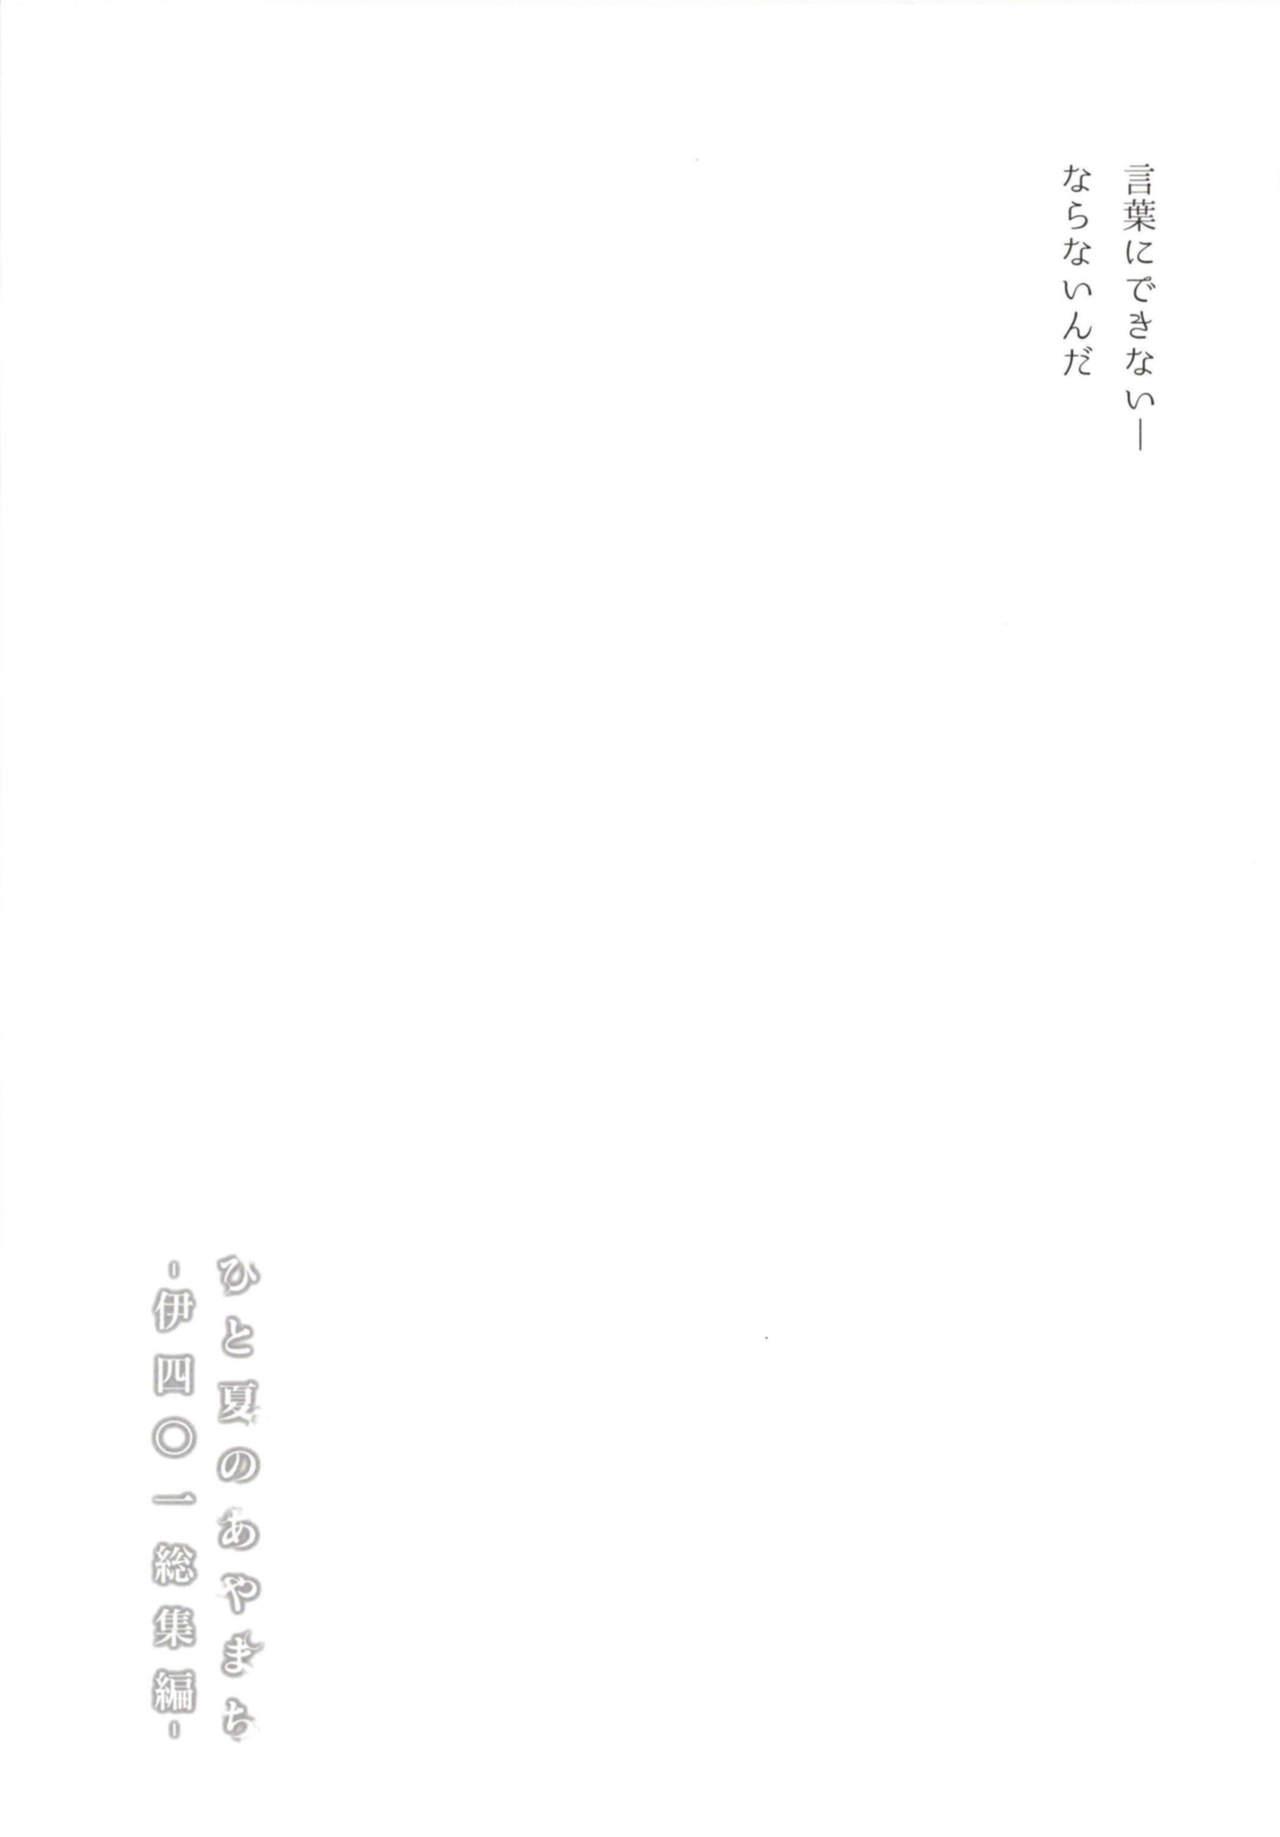 [French letter (Fujisaki Hikari)] Hitonatsu no Ayamachi -I-401 Soushuuhen- (Kantai Collection -KanColle-) [Digital] 58